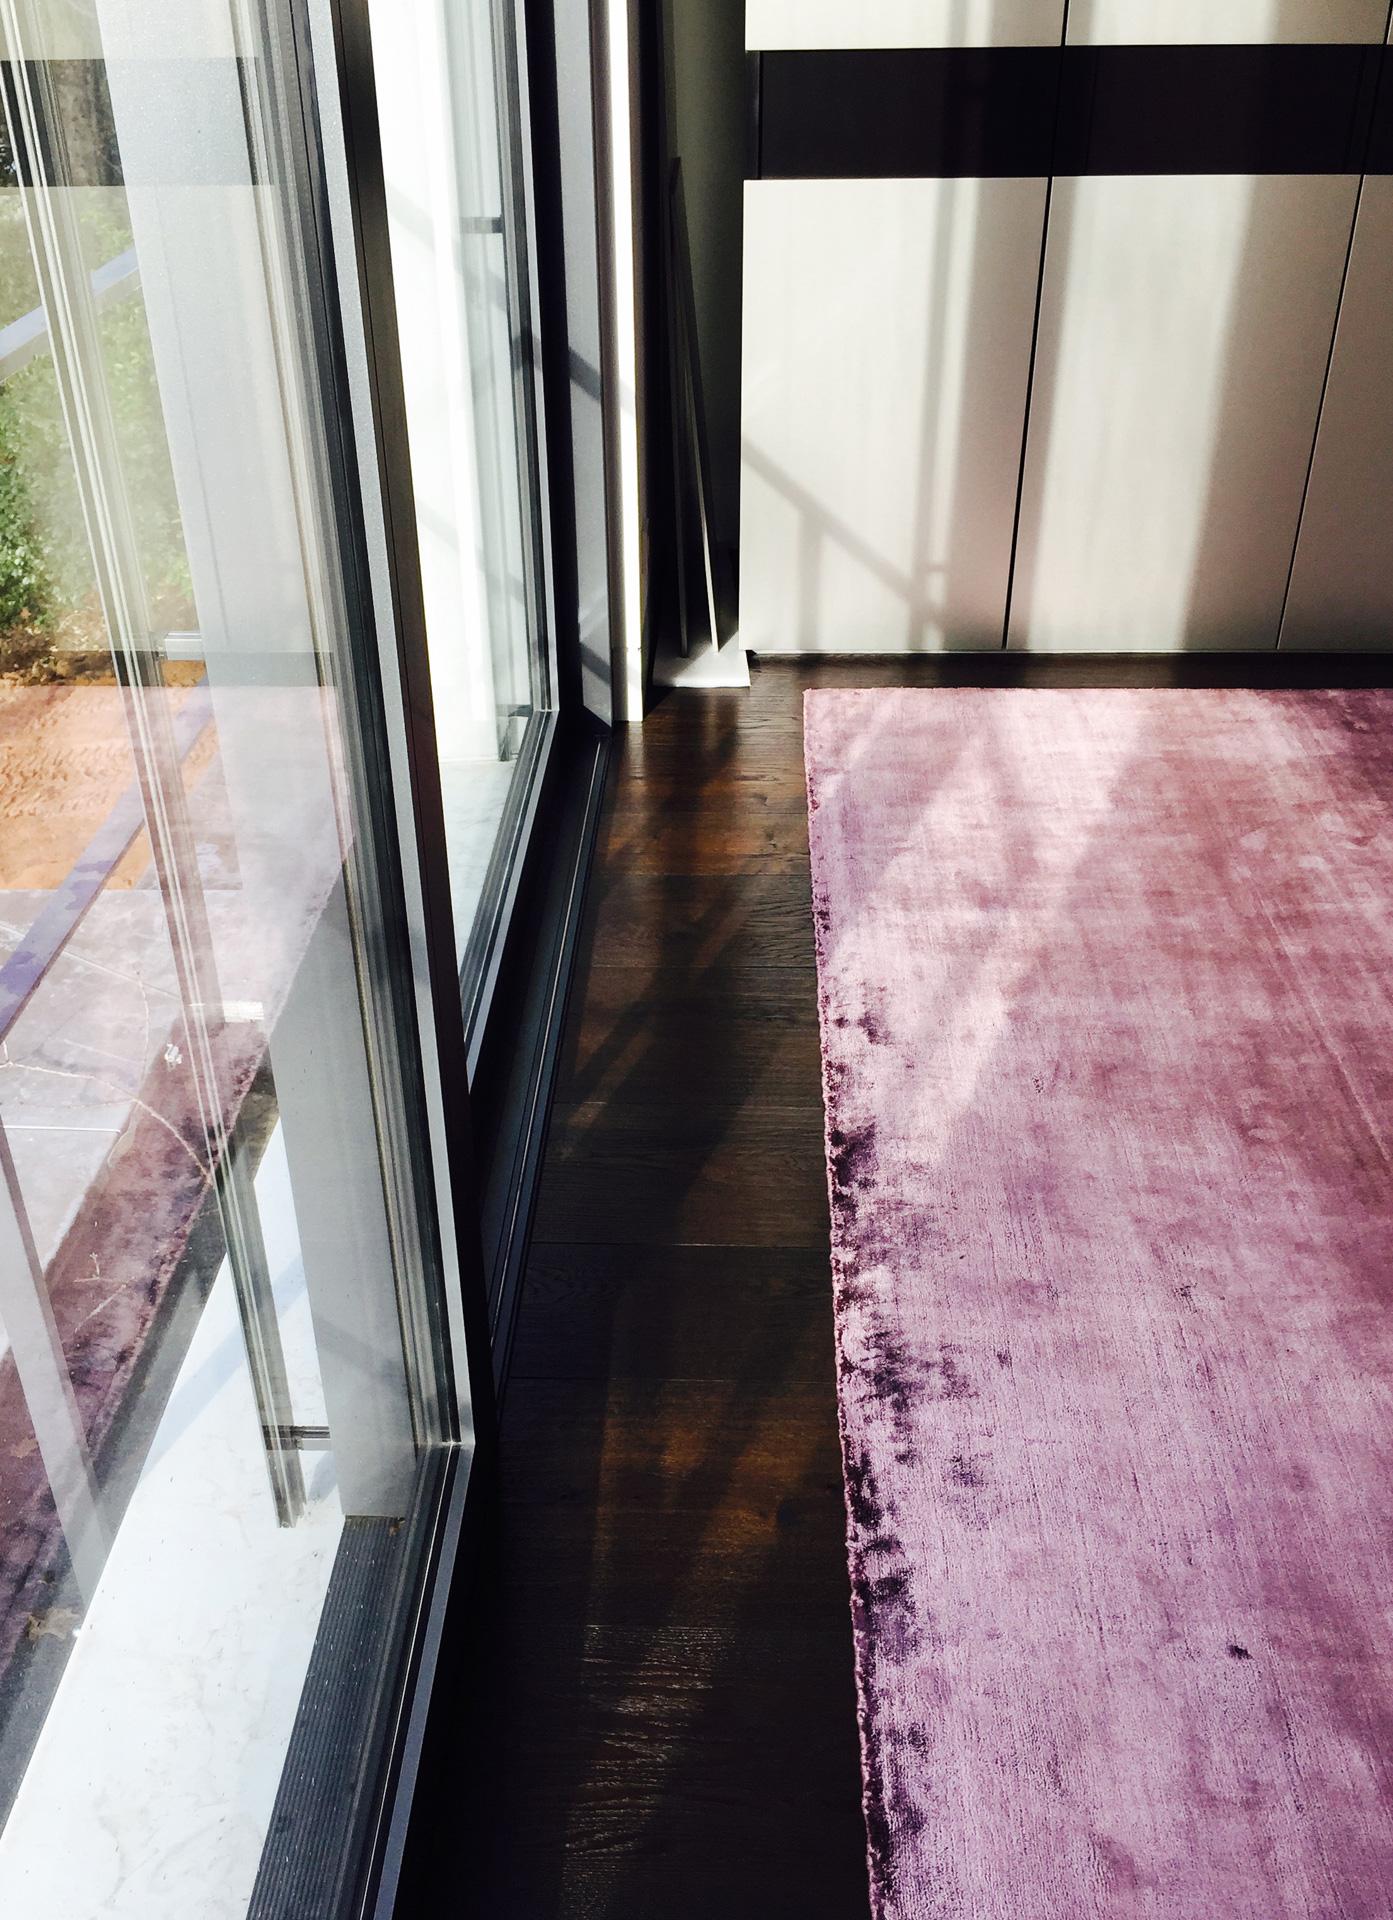 handgefertigte teppiche raumausstattung silko sch ler. Black Bedroom Furniture Sets. Home Design Ideas